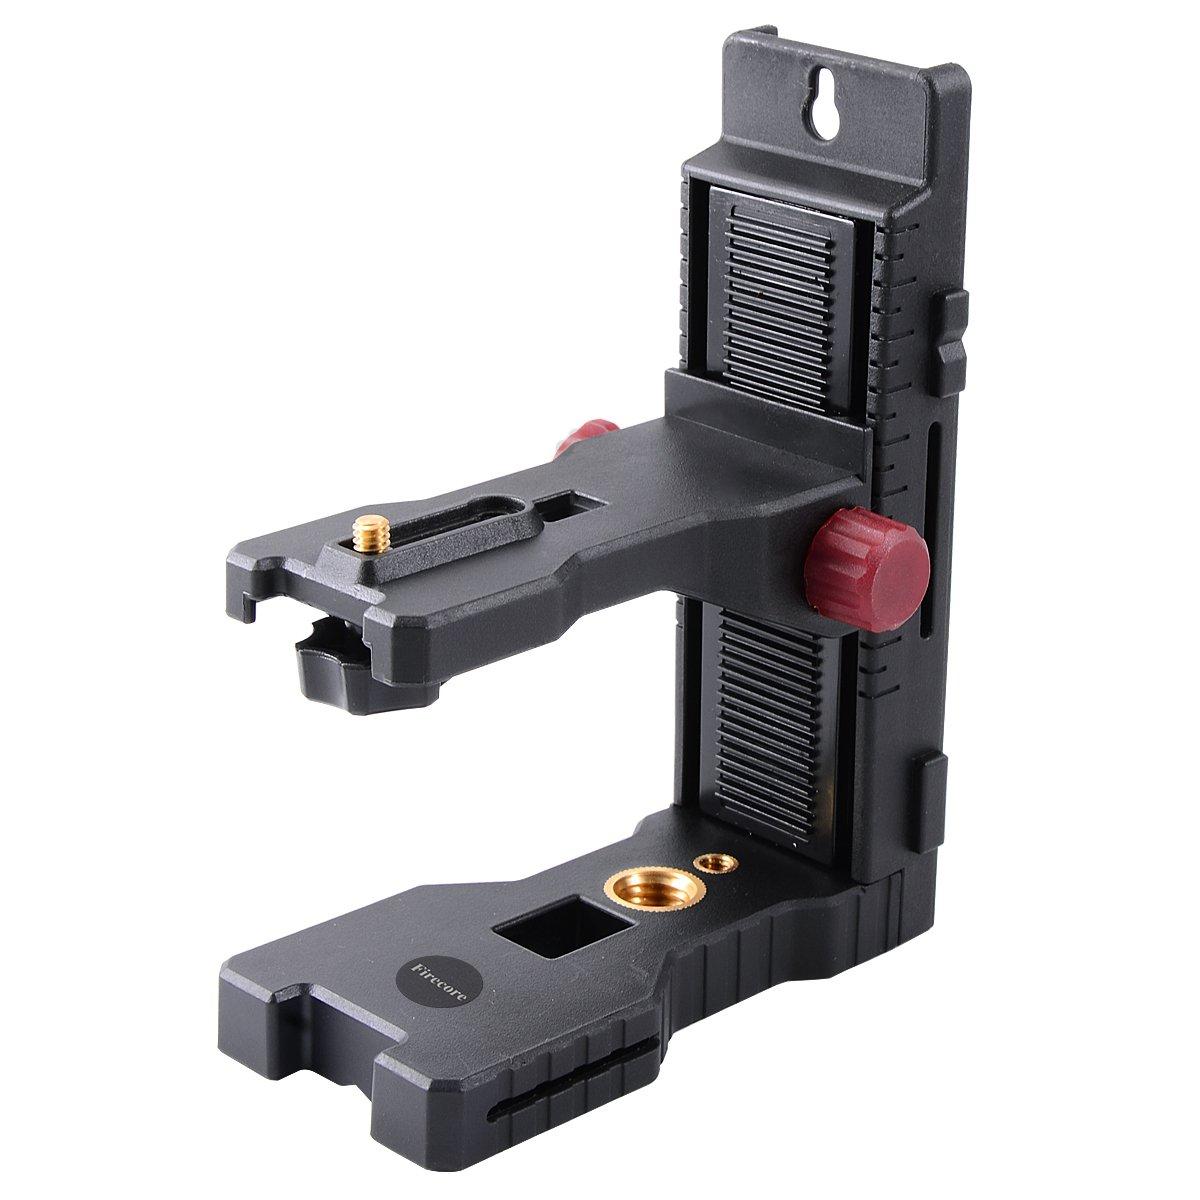 Firecore Magnet Bracket L-shape Laser Level Adapter